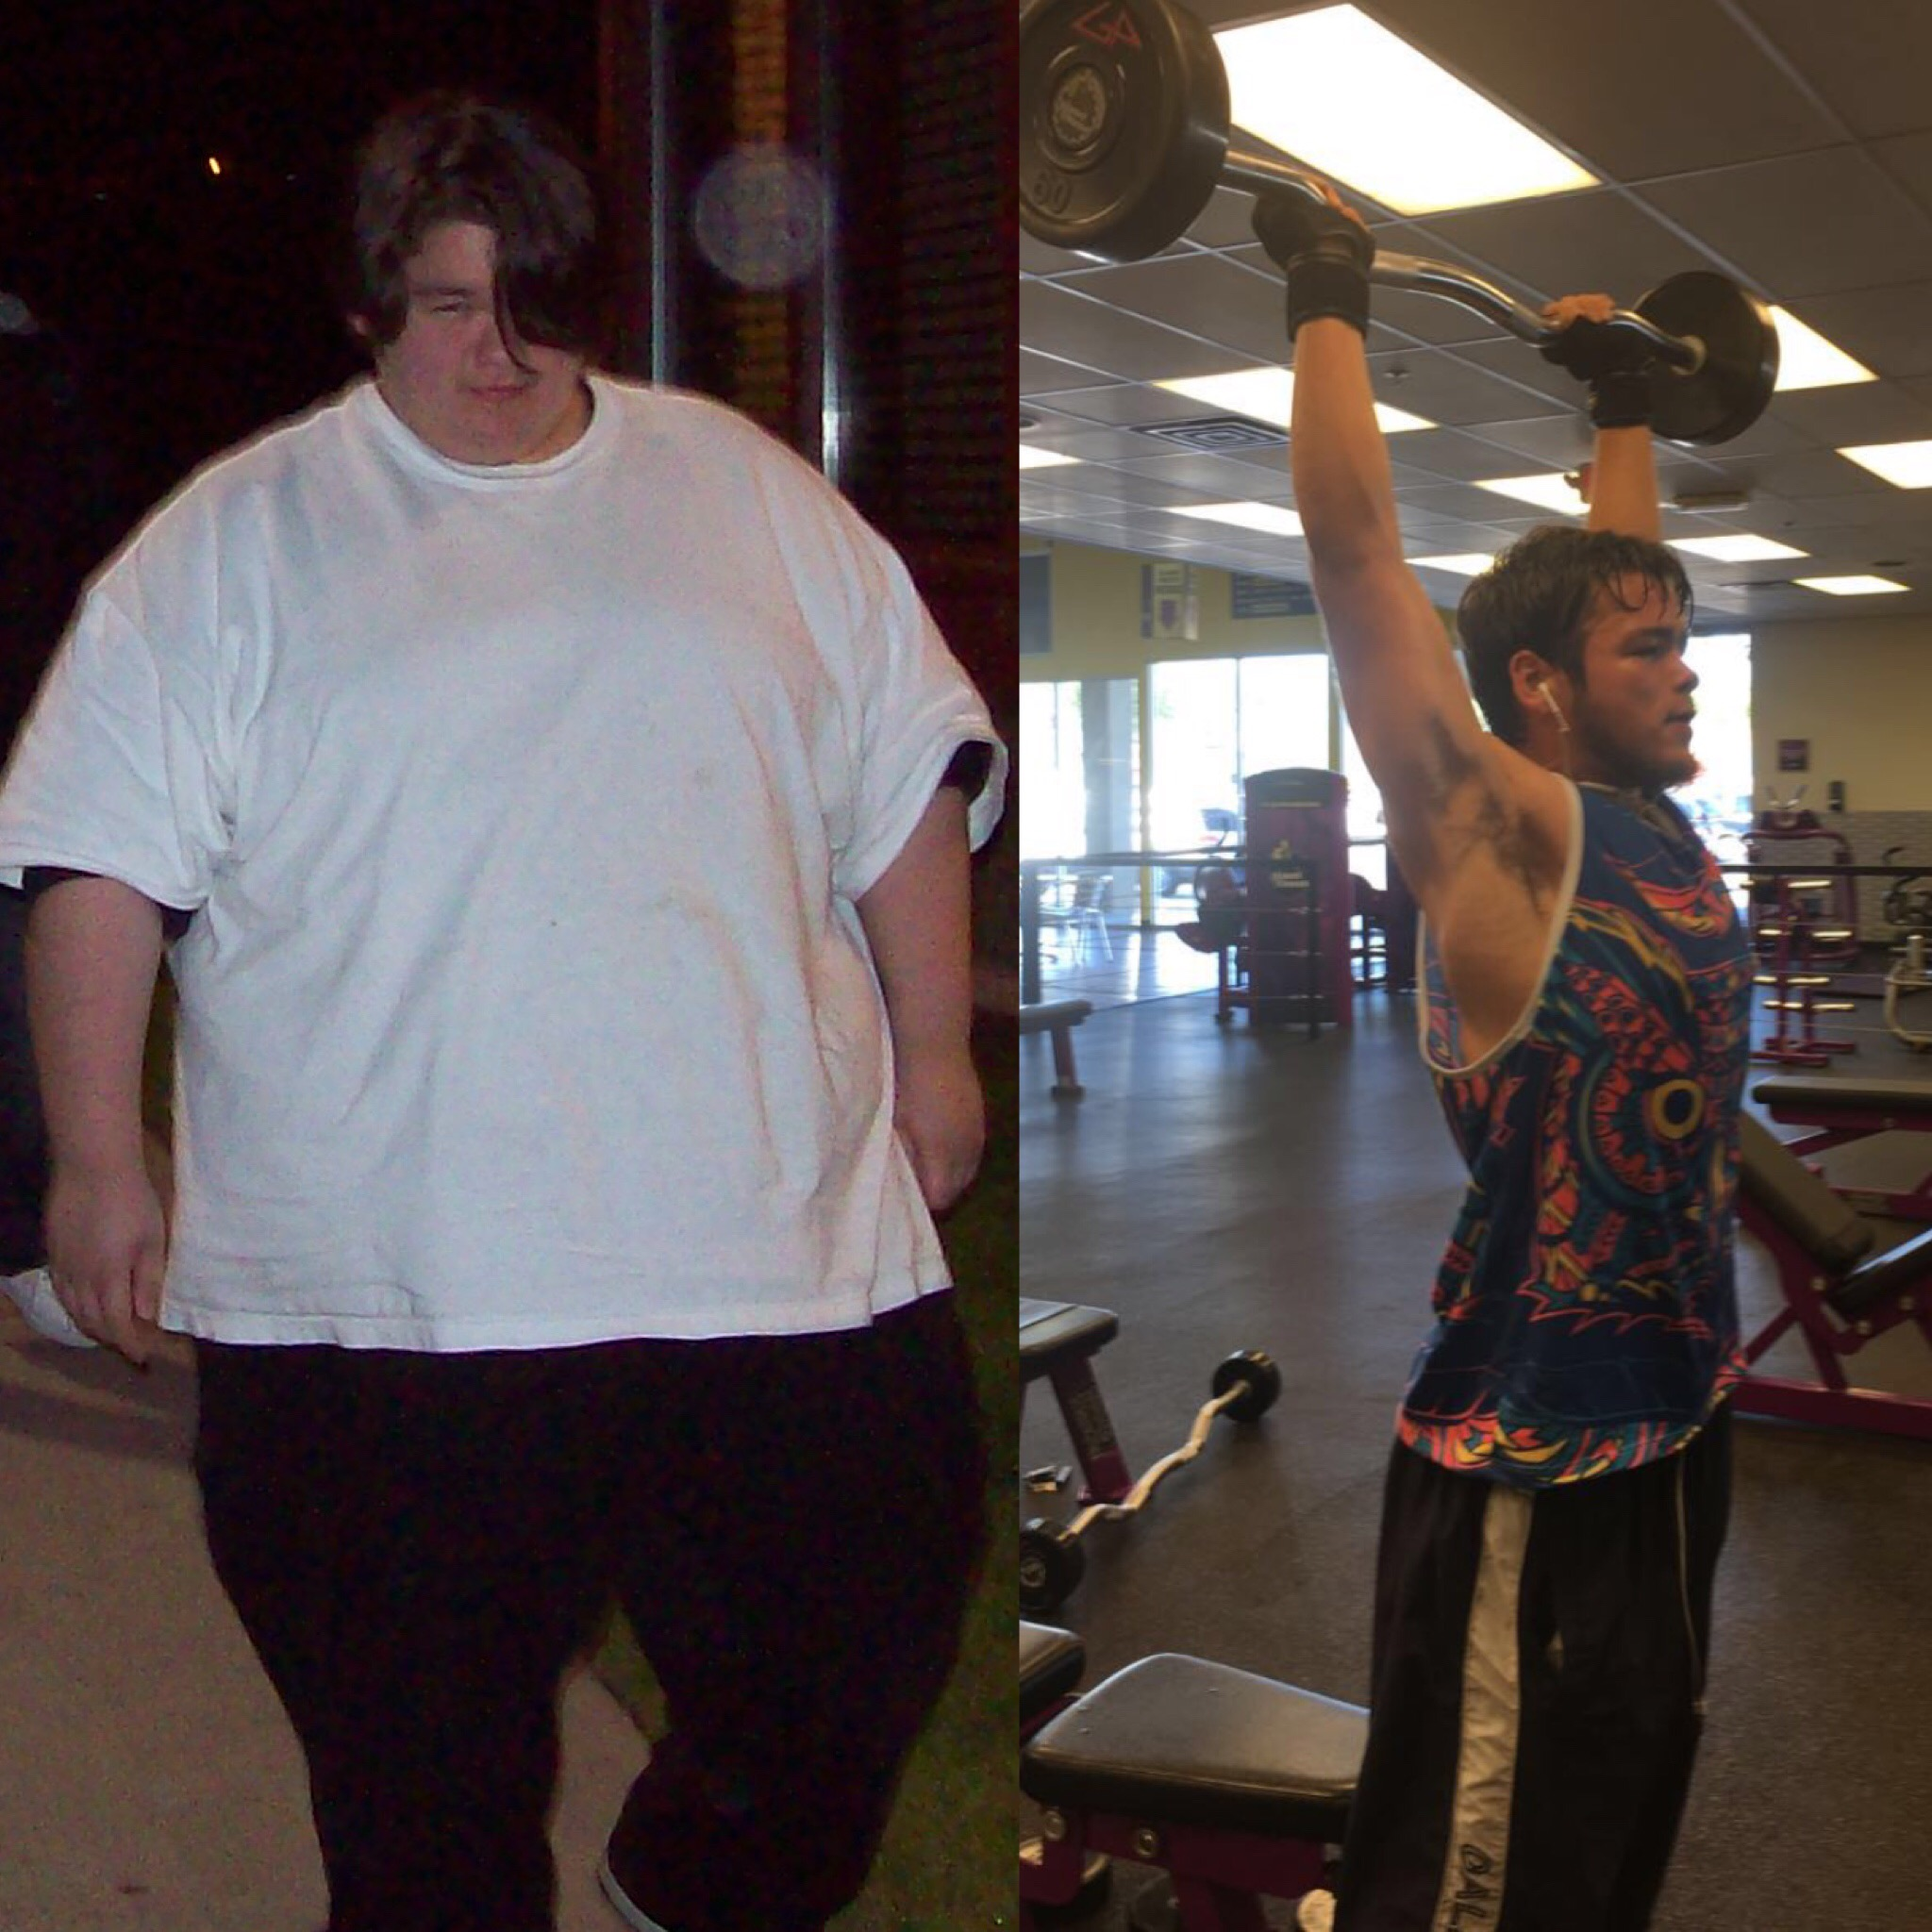 Lucas Gutierrez has transformed his life, having lost 300 pounds since 2008.